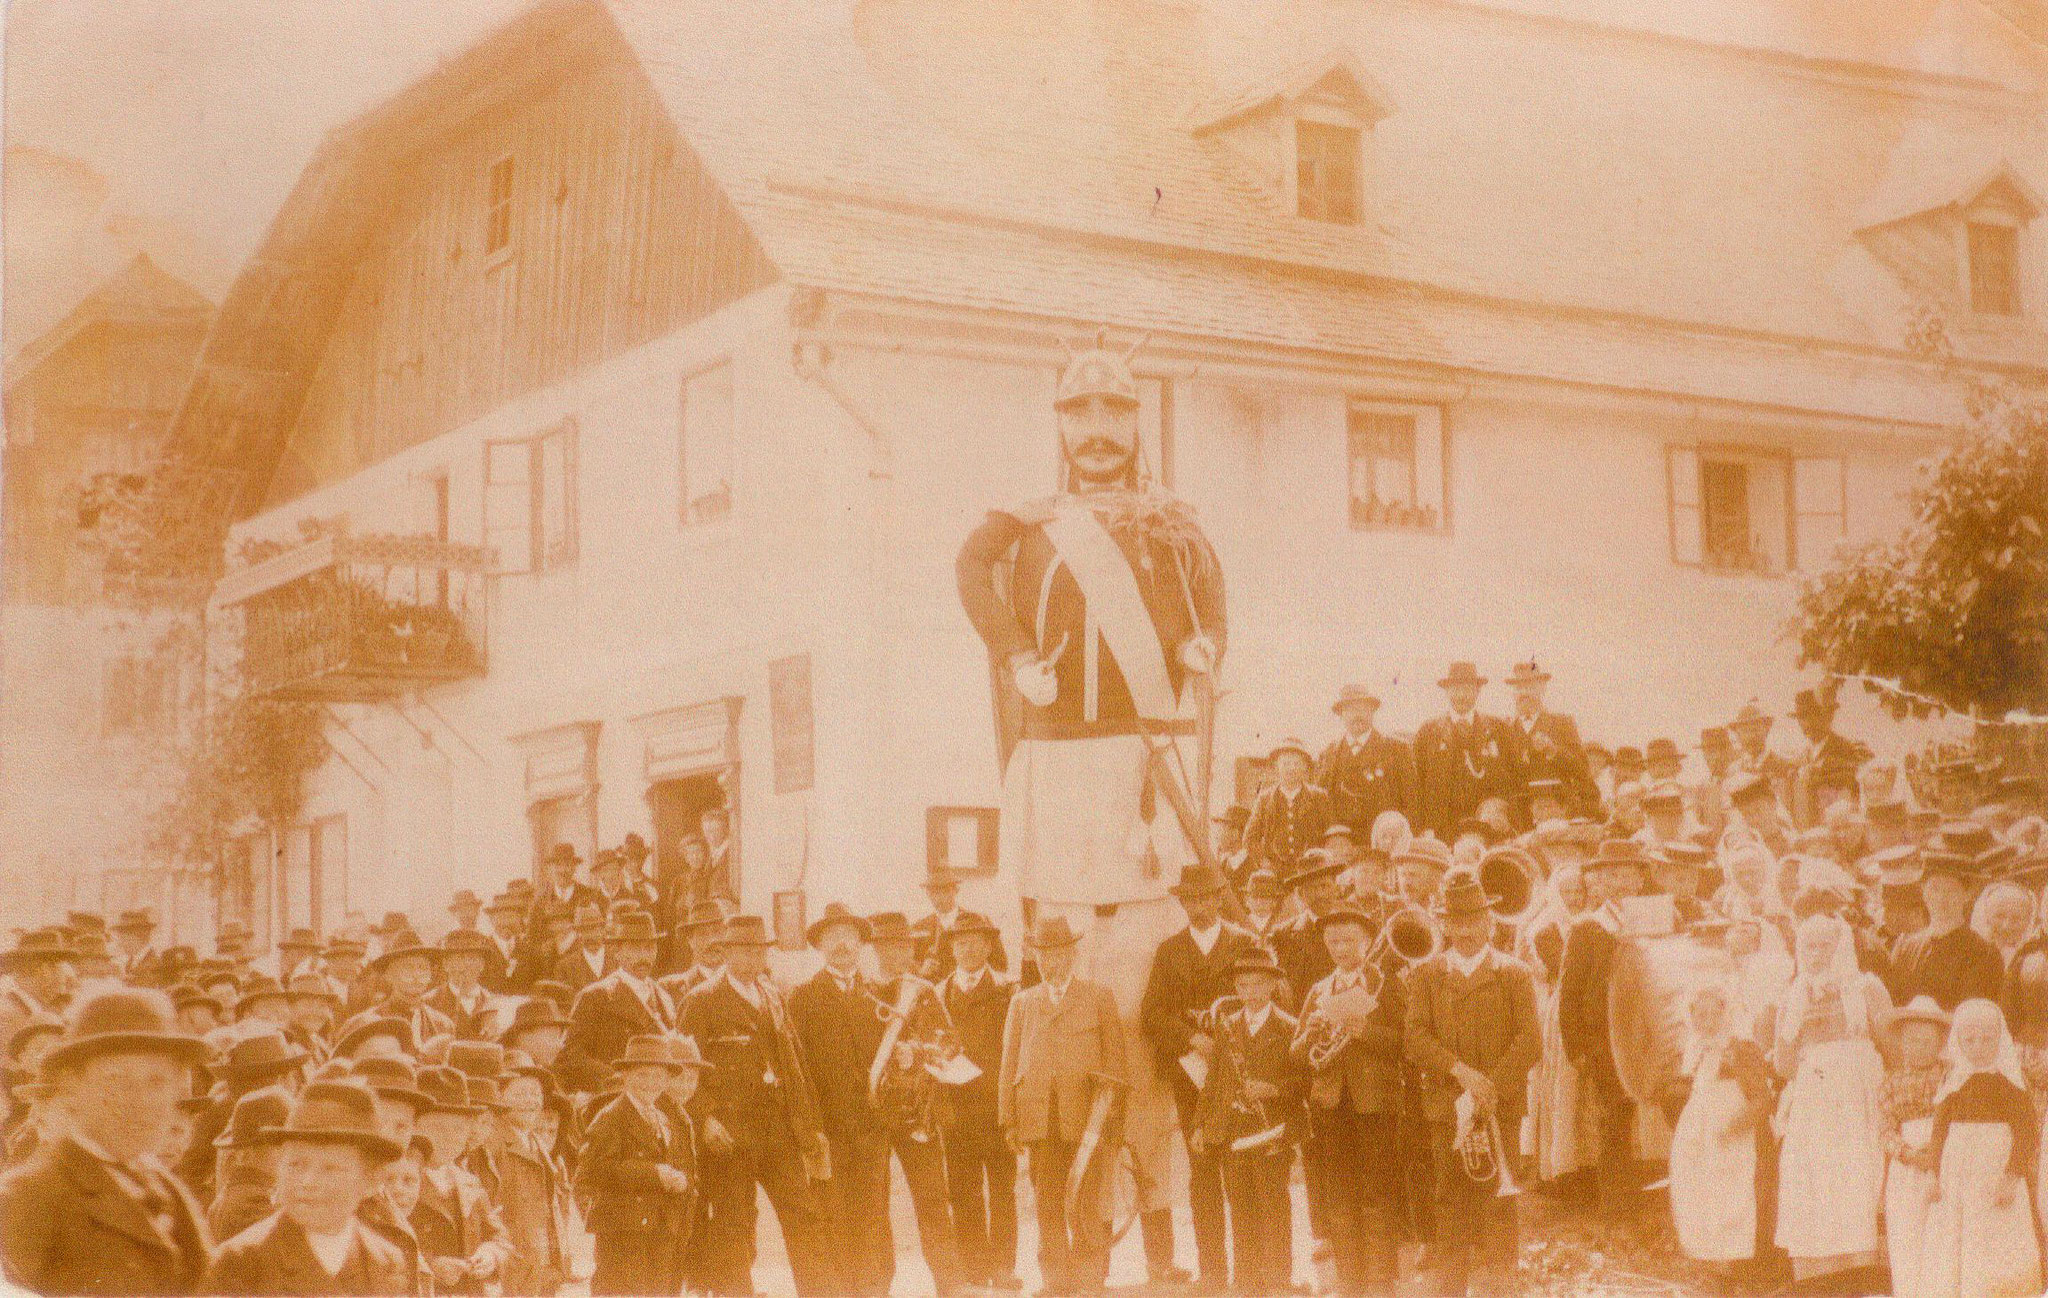 (c) Lungauer Heimatmuseum Tamsweg